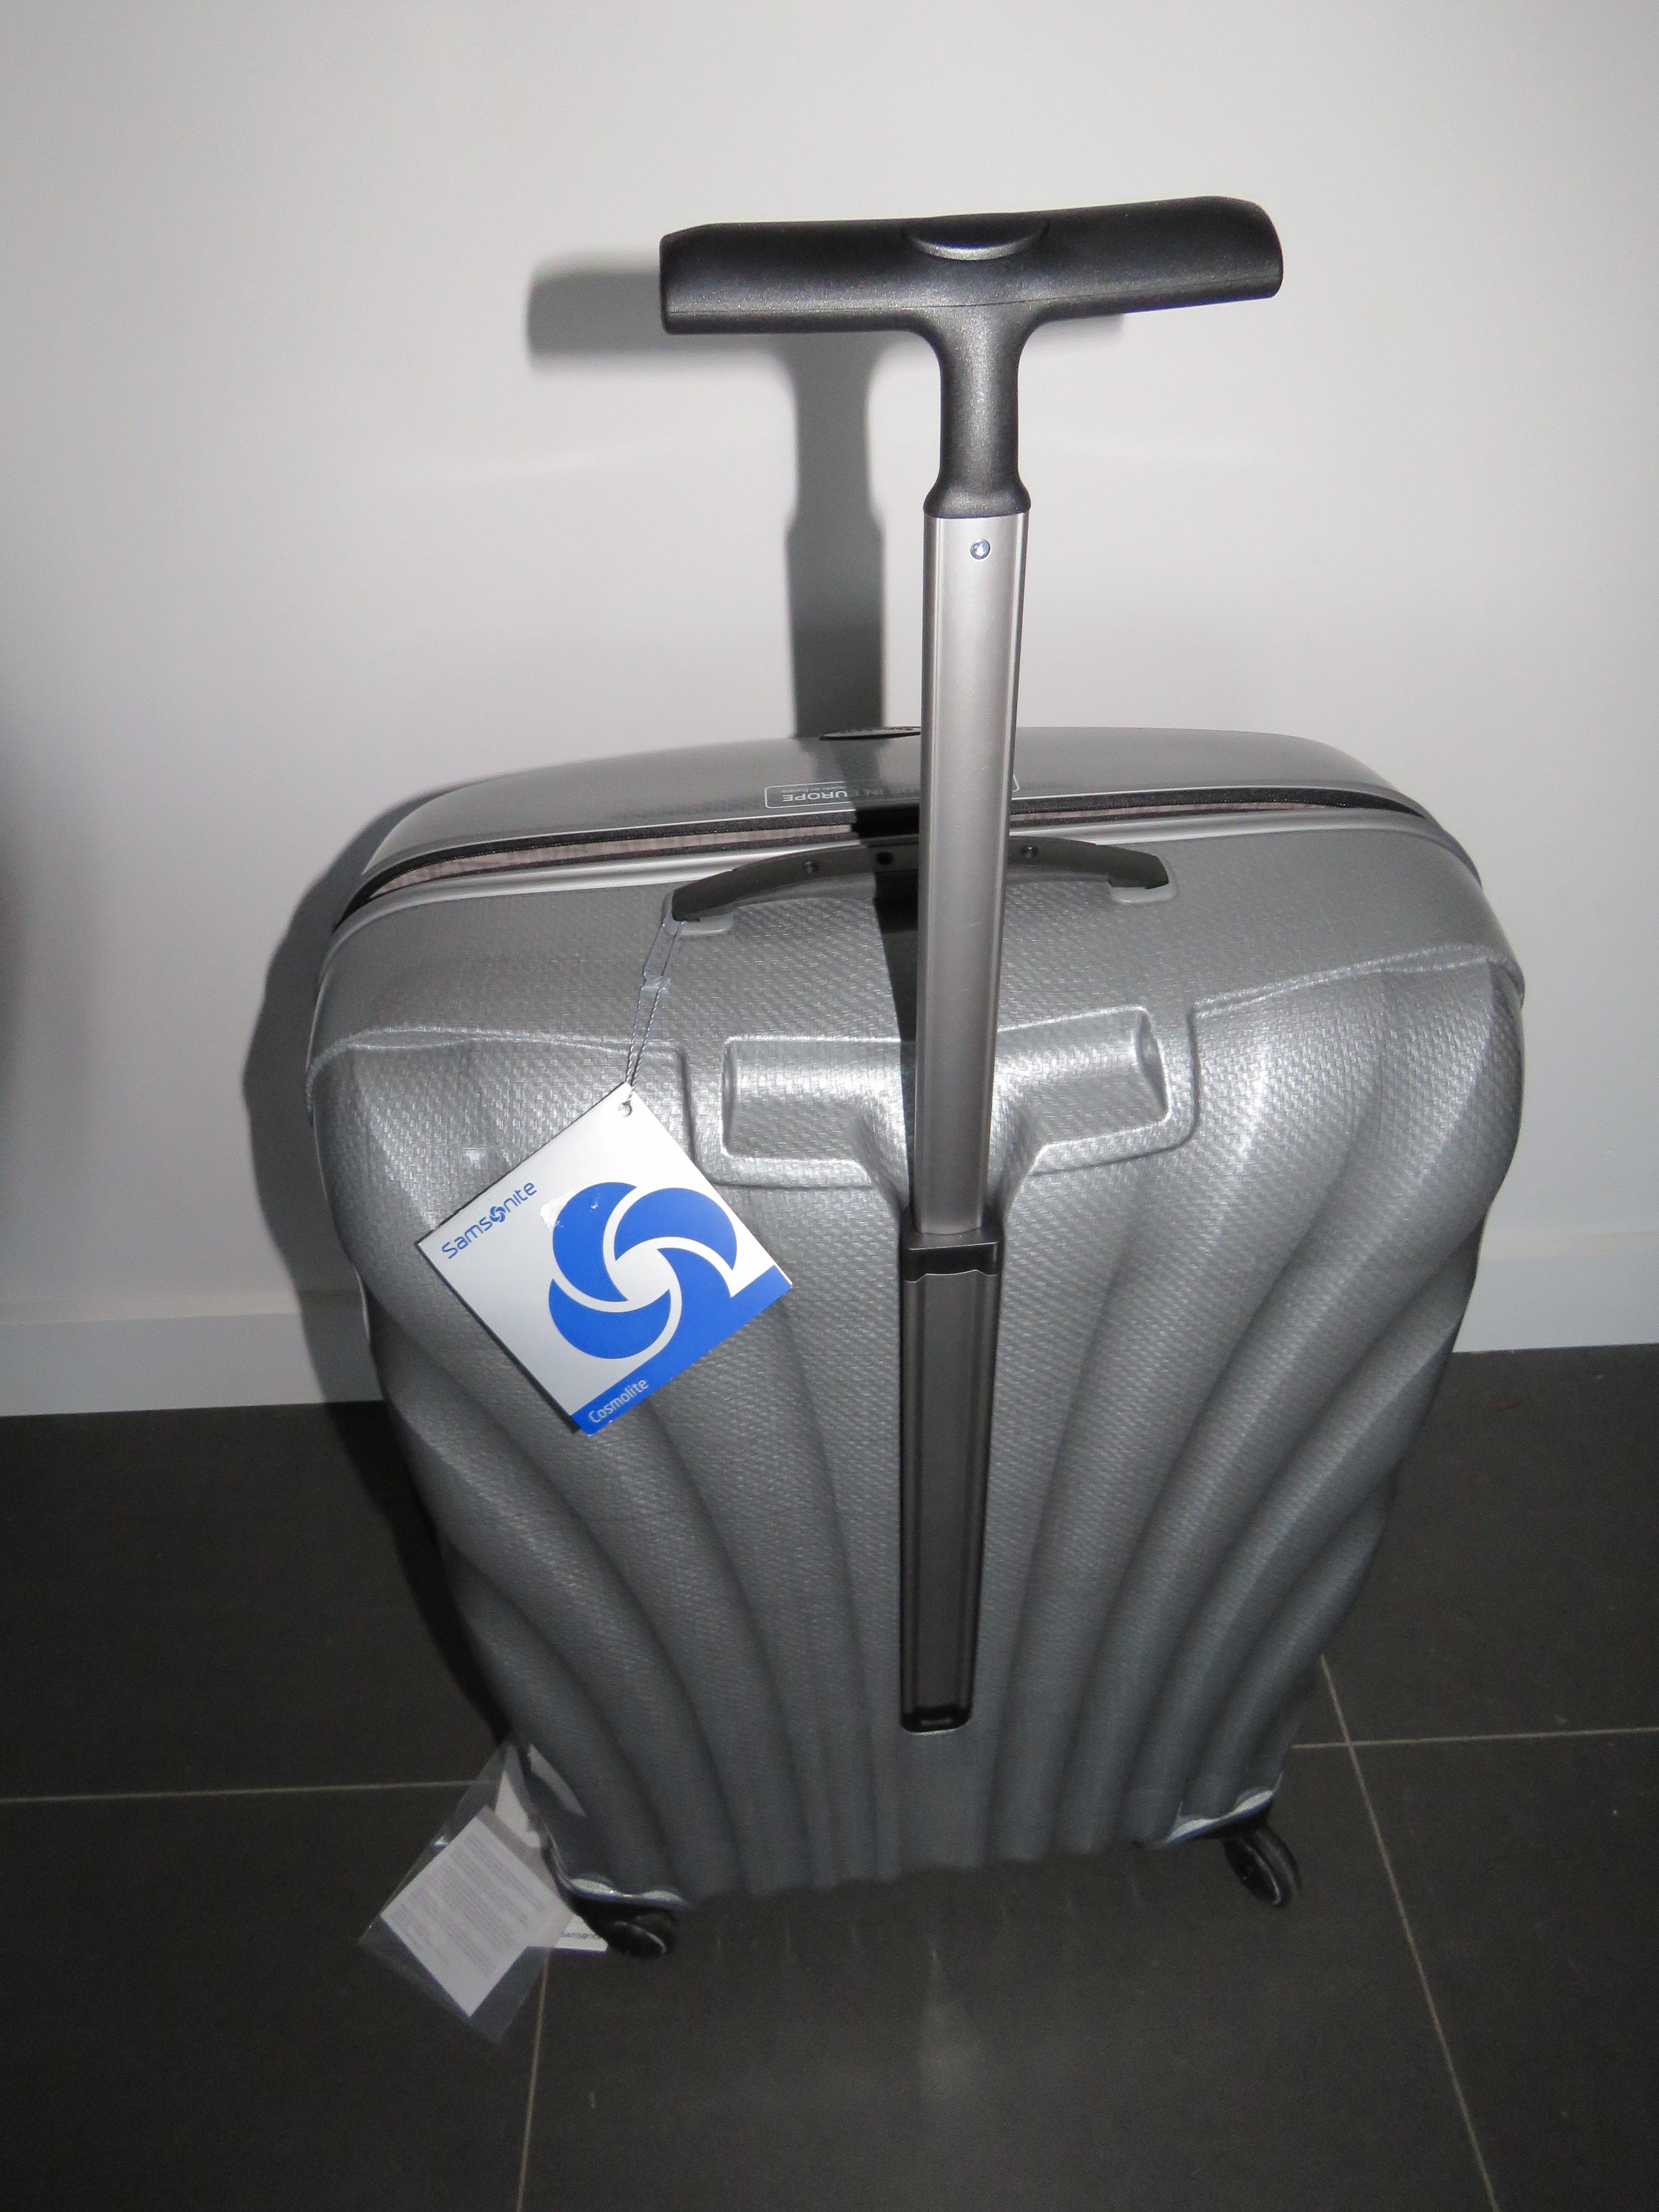 purchase good luggage